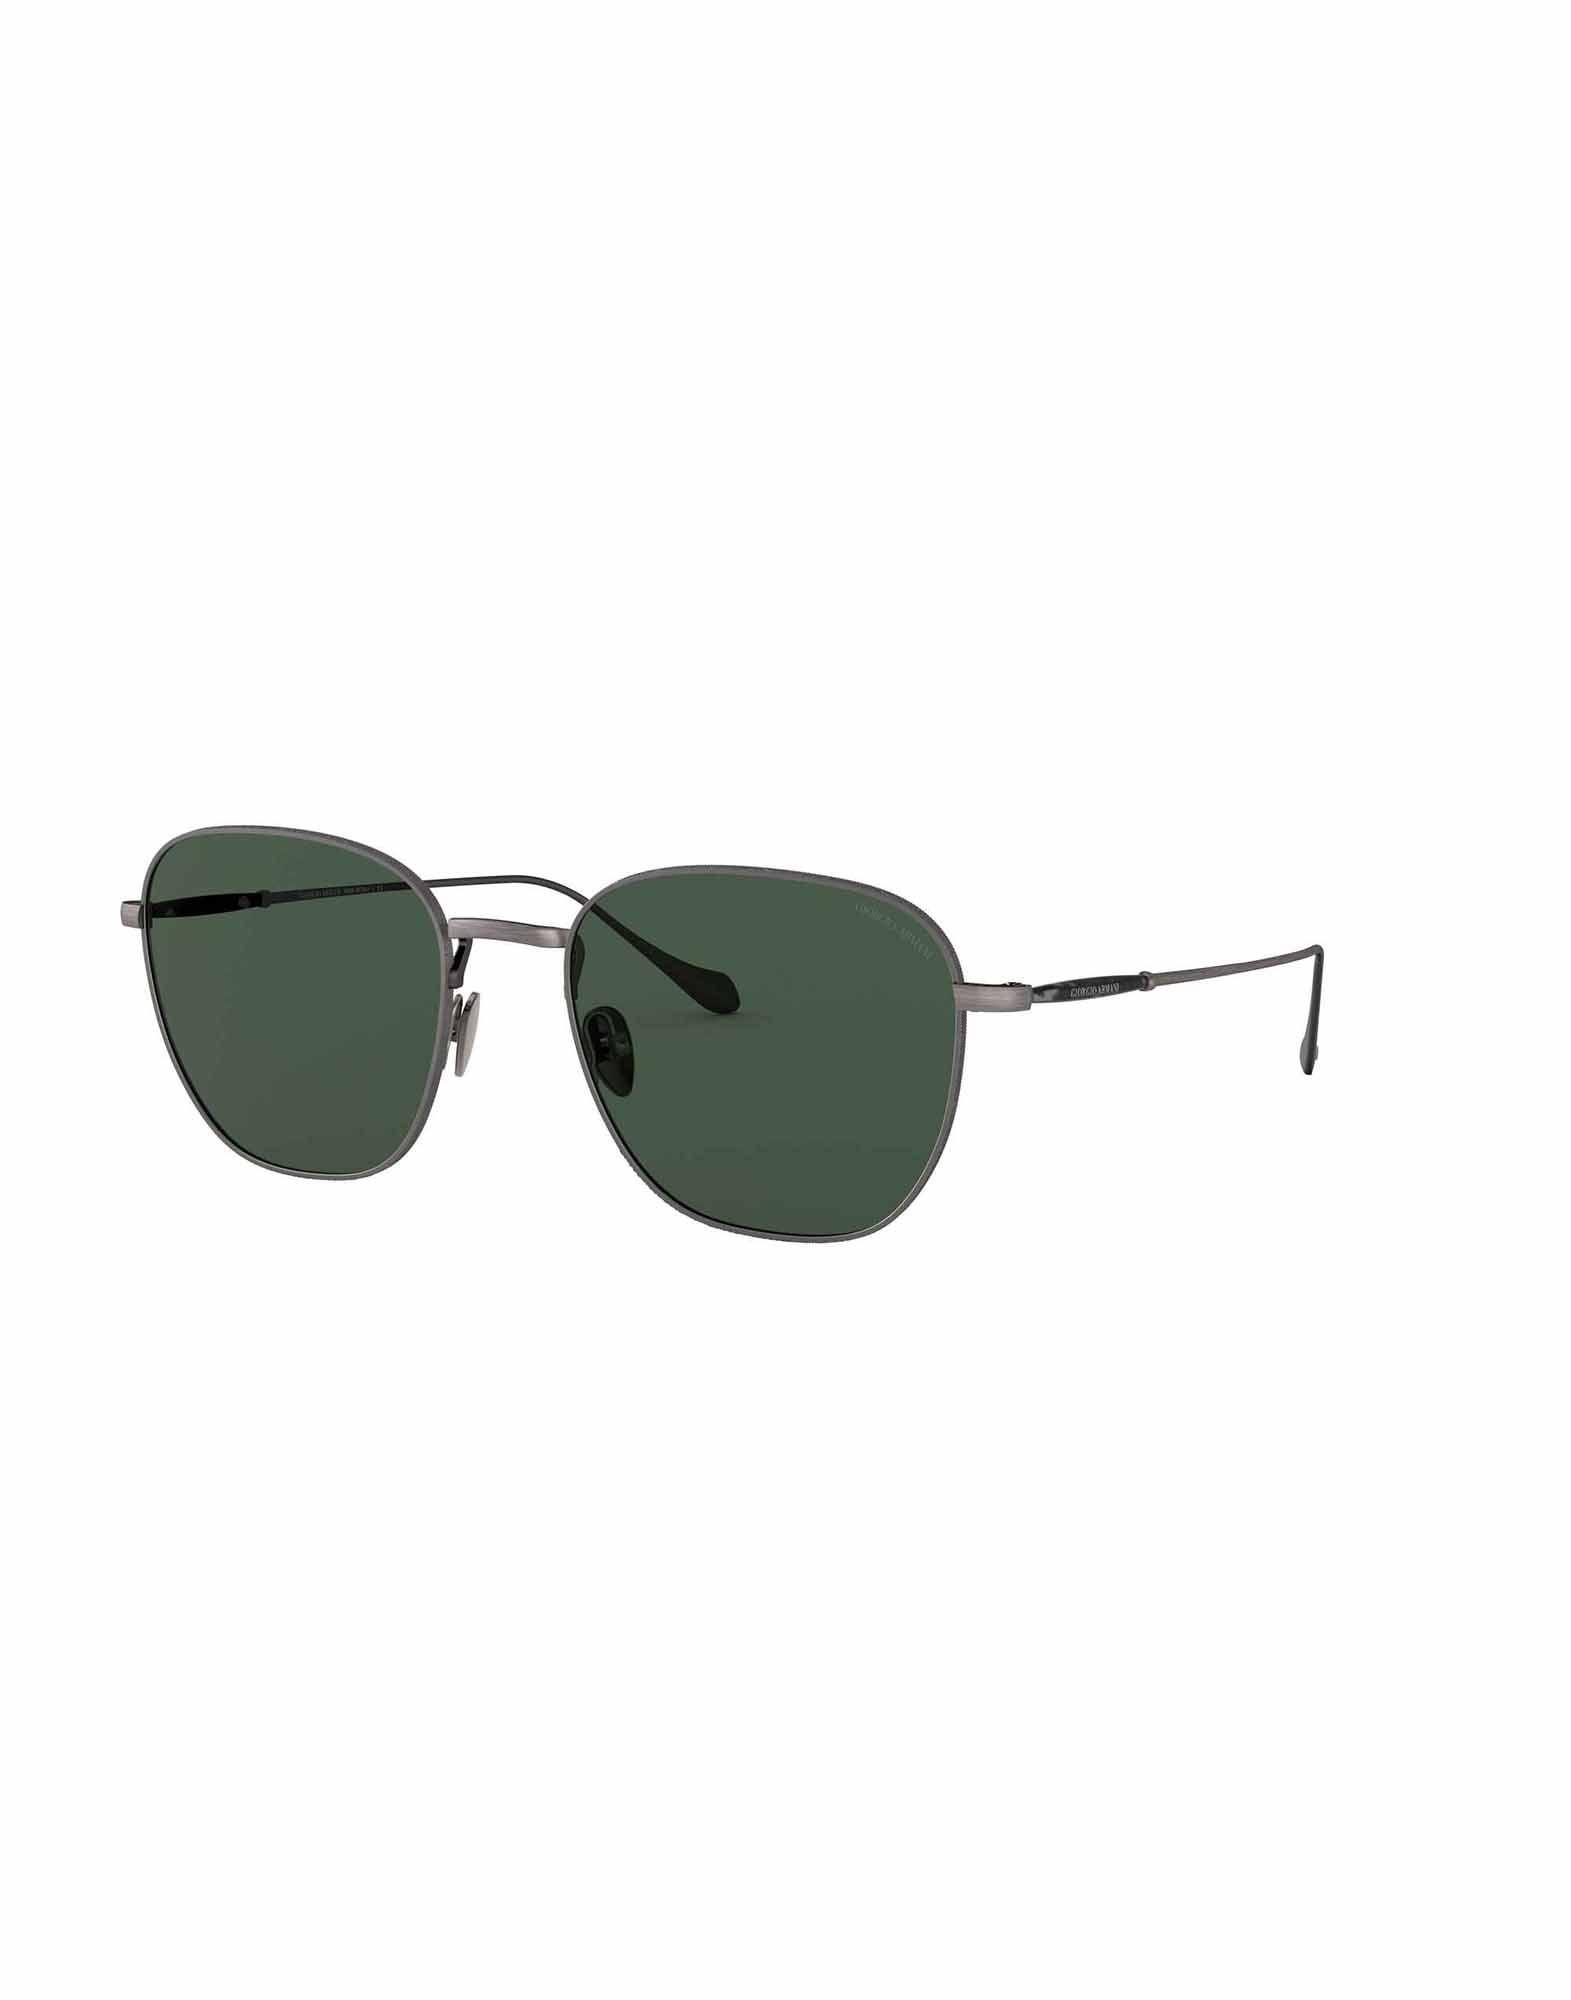 GIORGIO ARMANI Солнечные очки перчатки giorgio armani